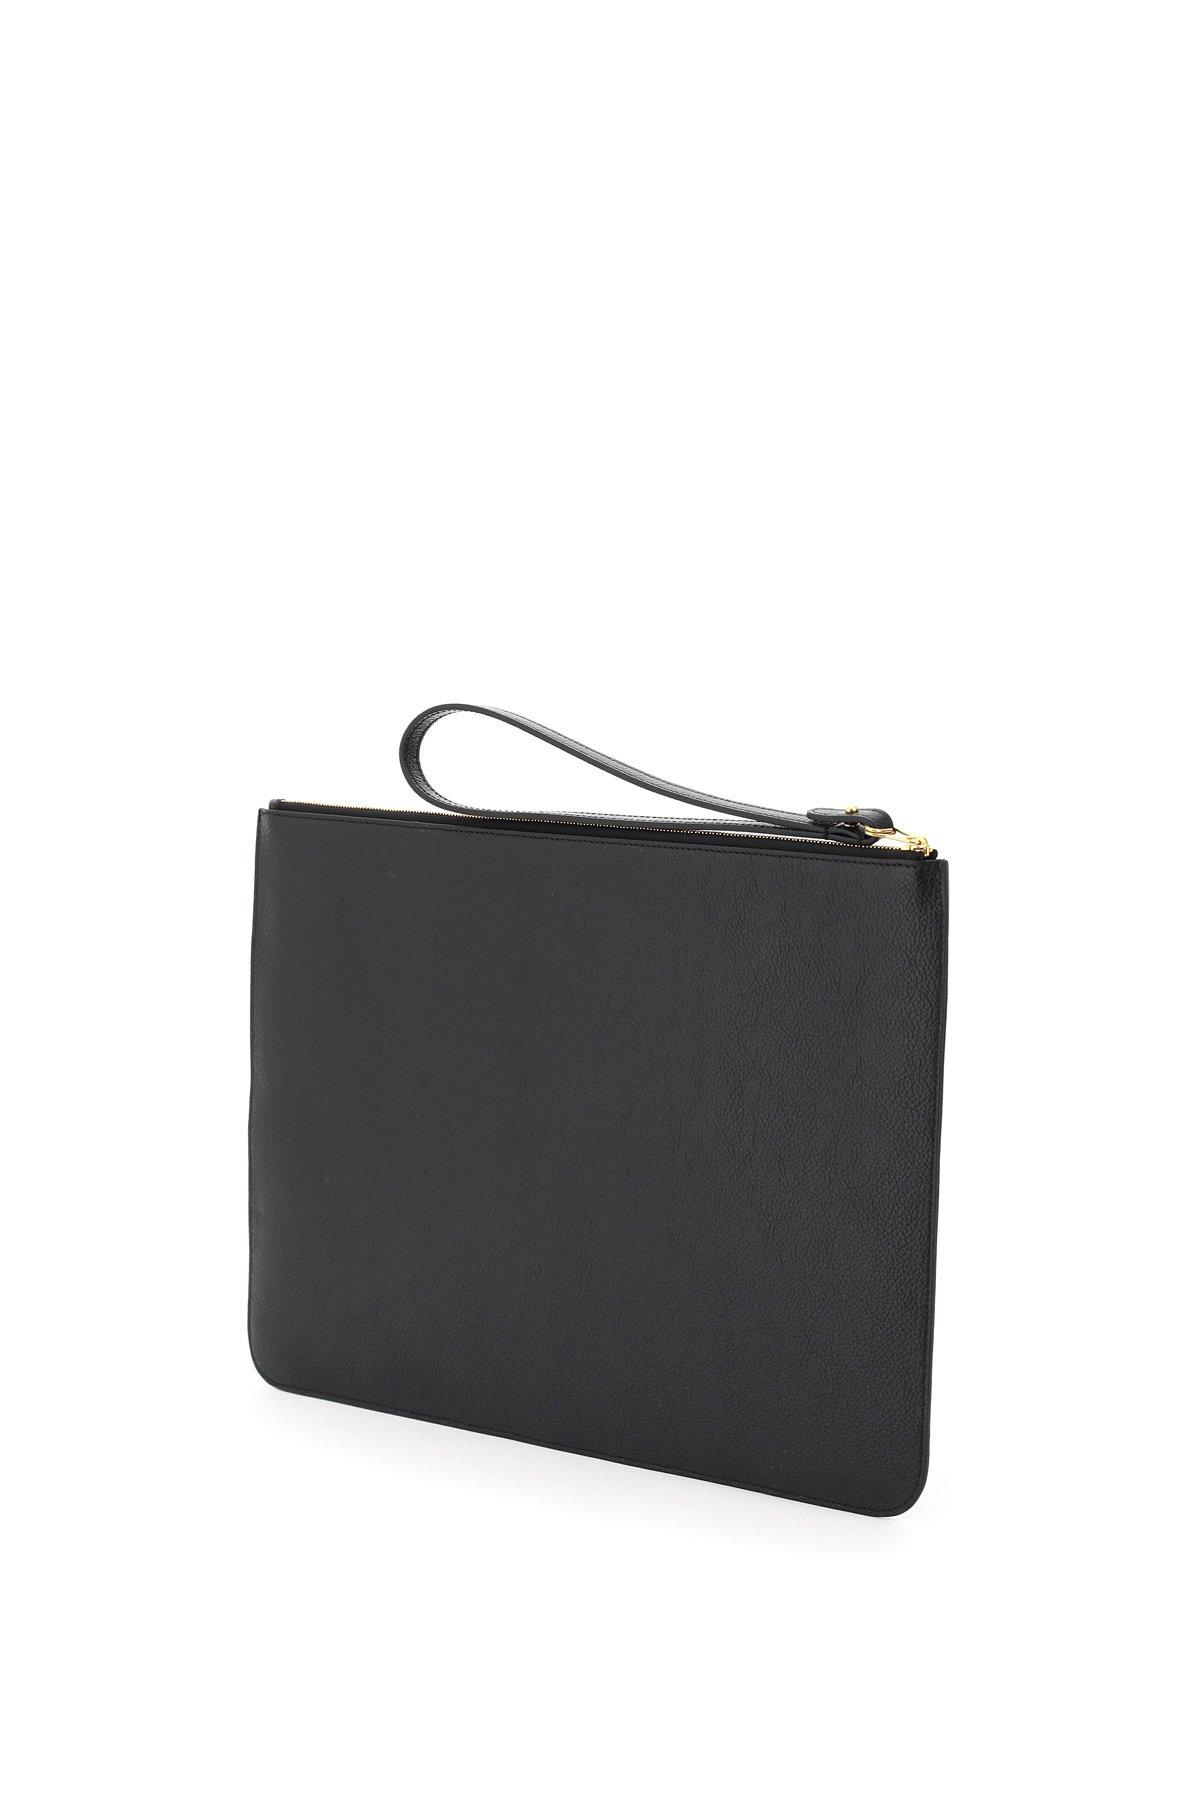 Balenciaga pouch cash large